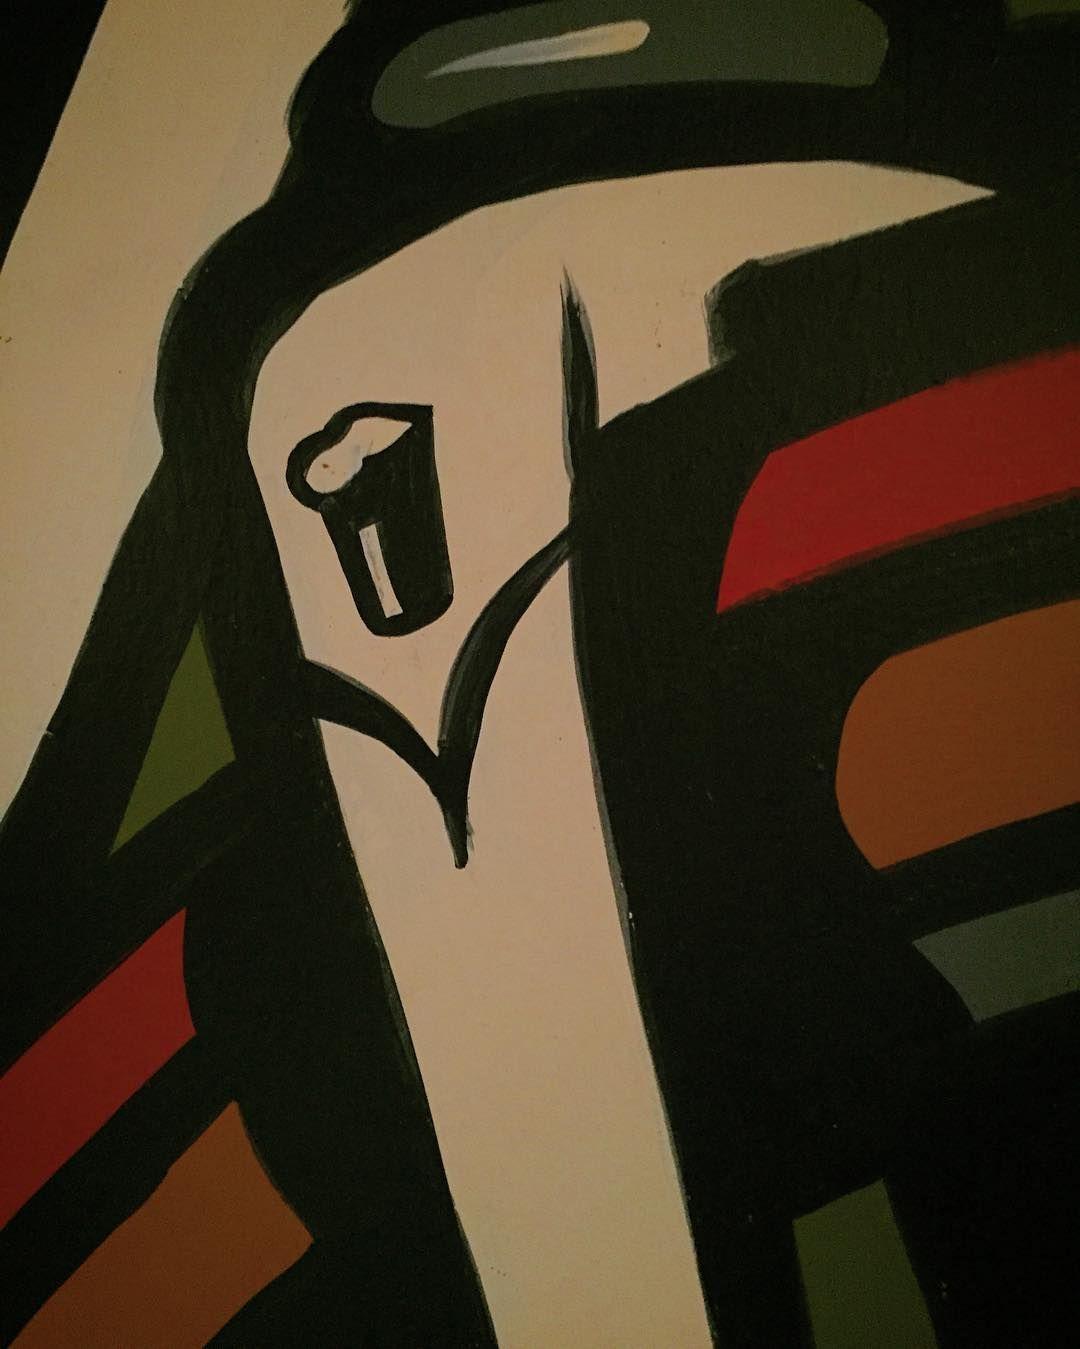 Mural details @612brew #mplsbeer